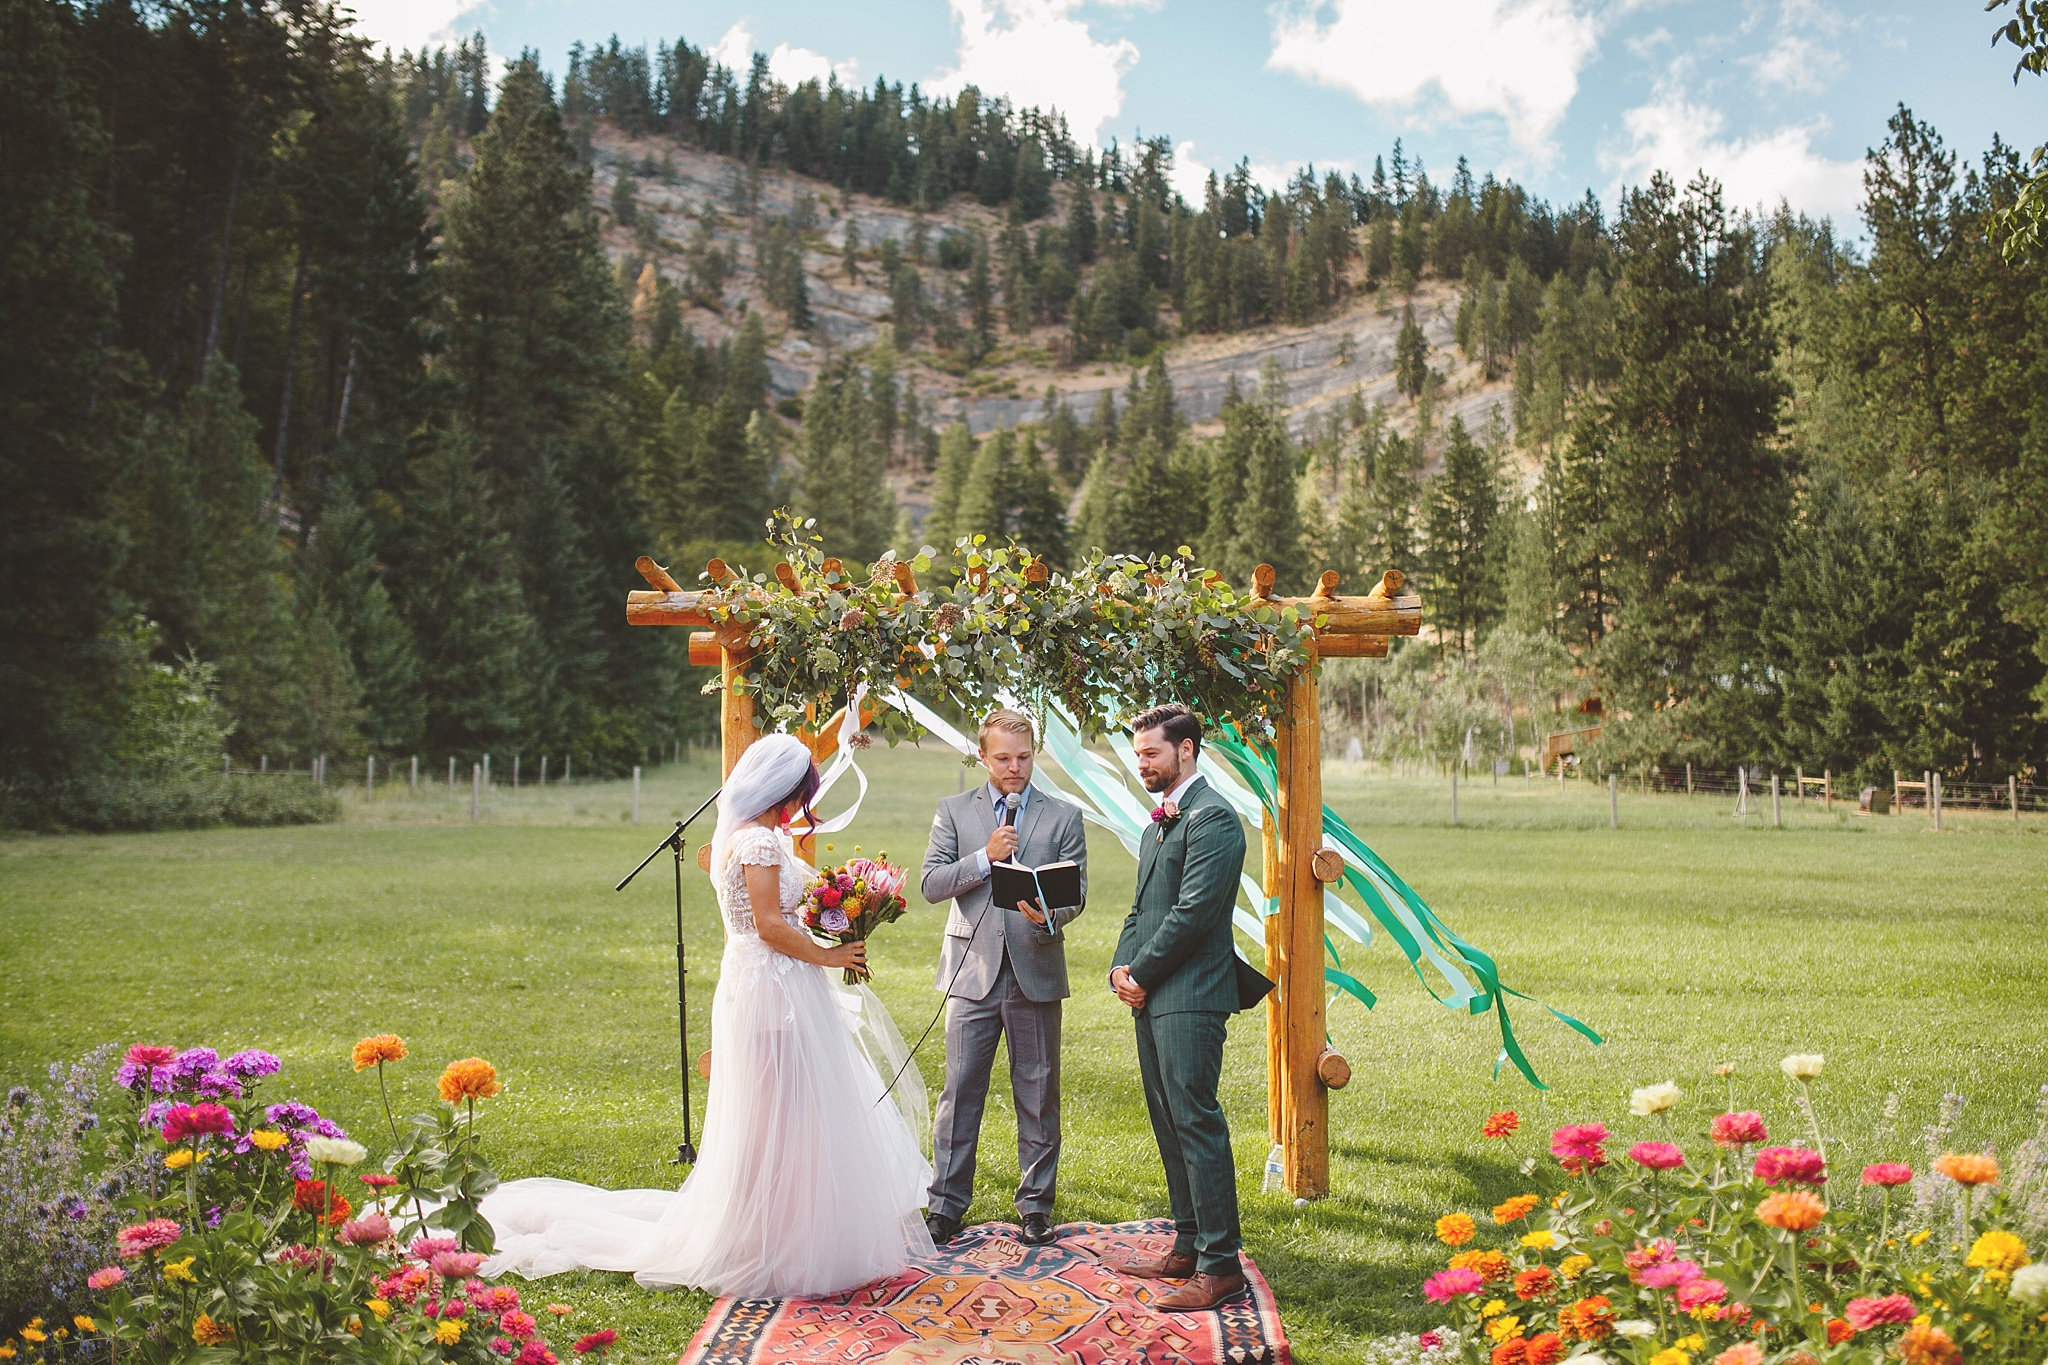 national park wedding ceremony